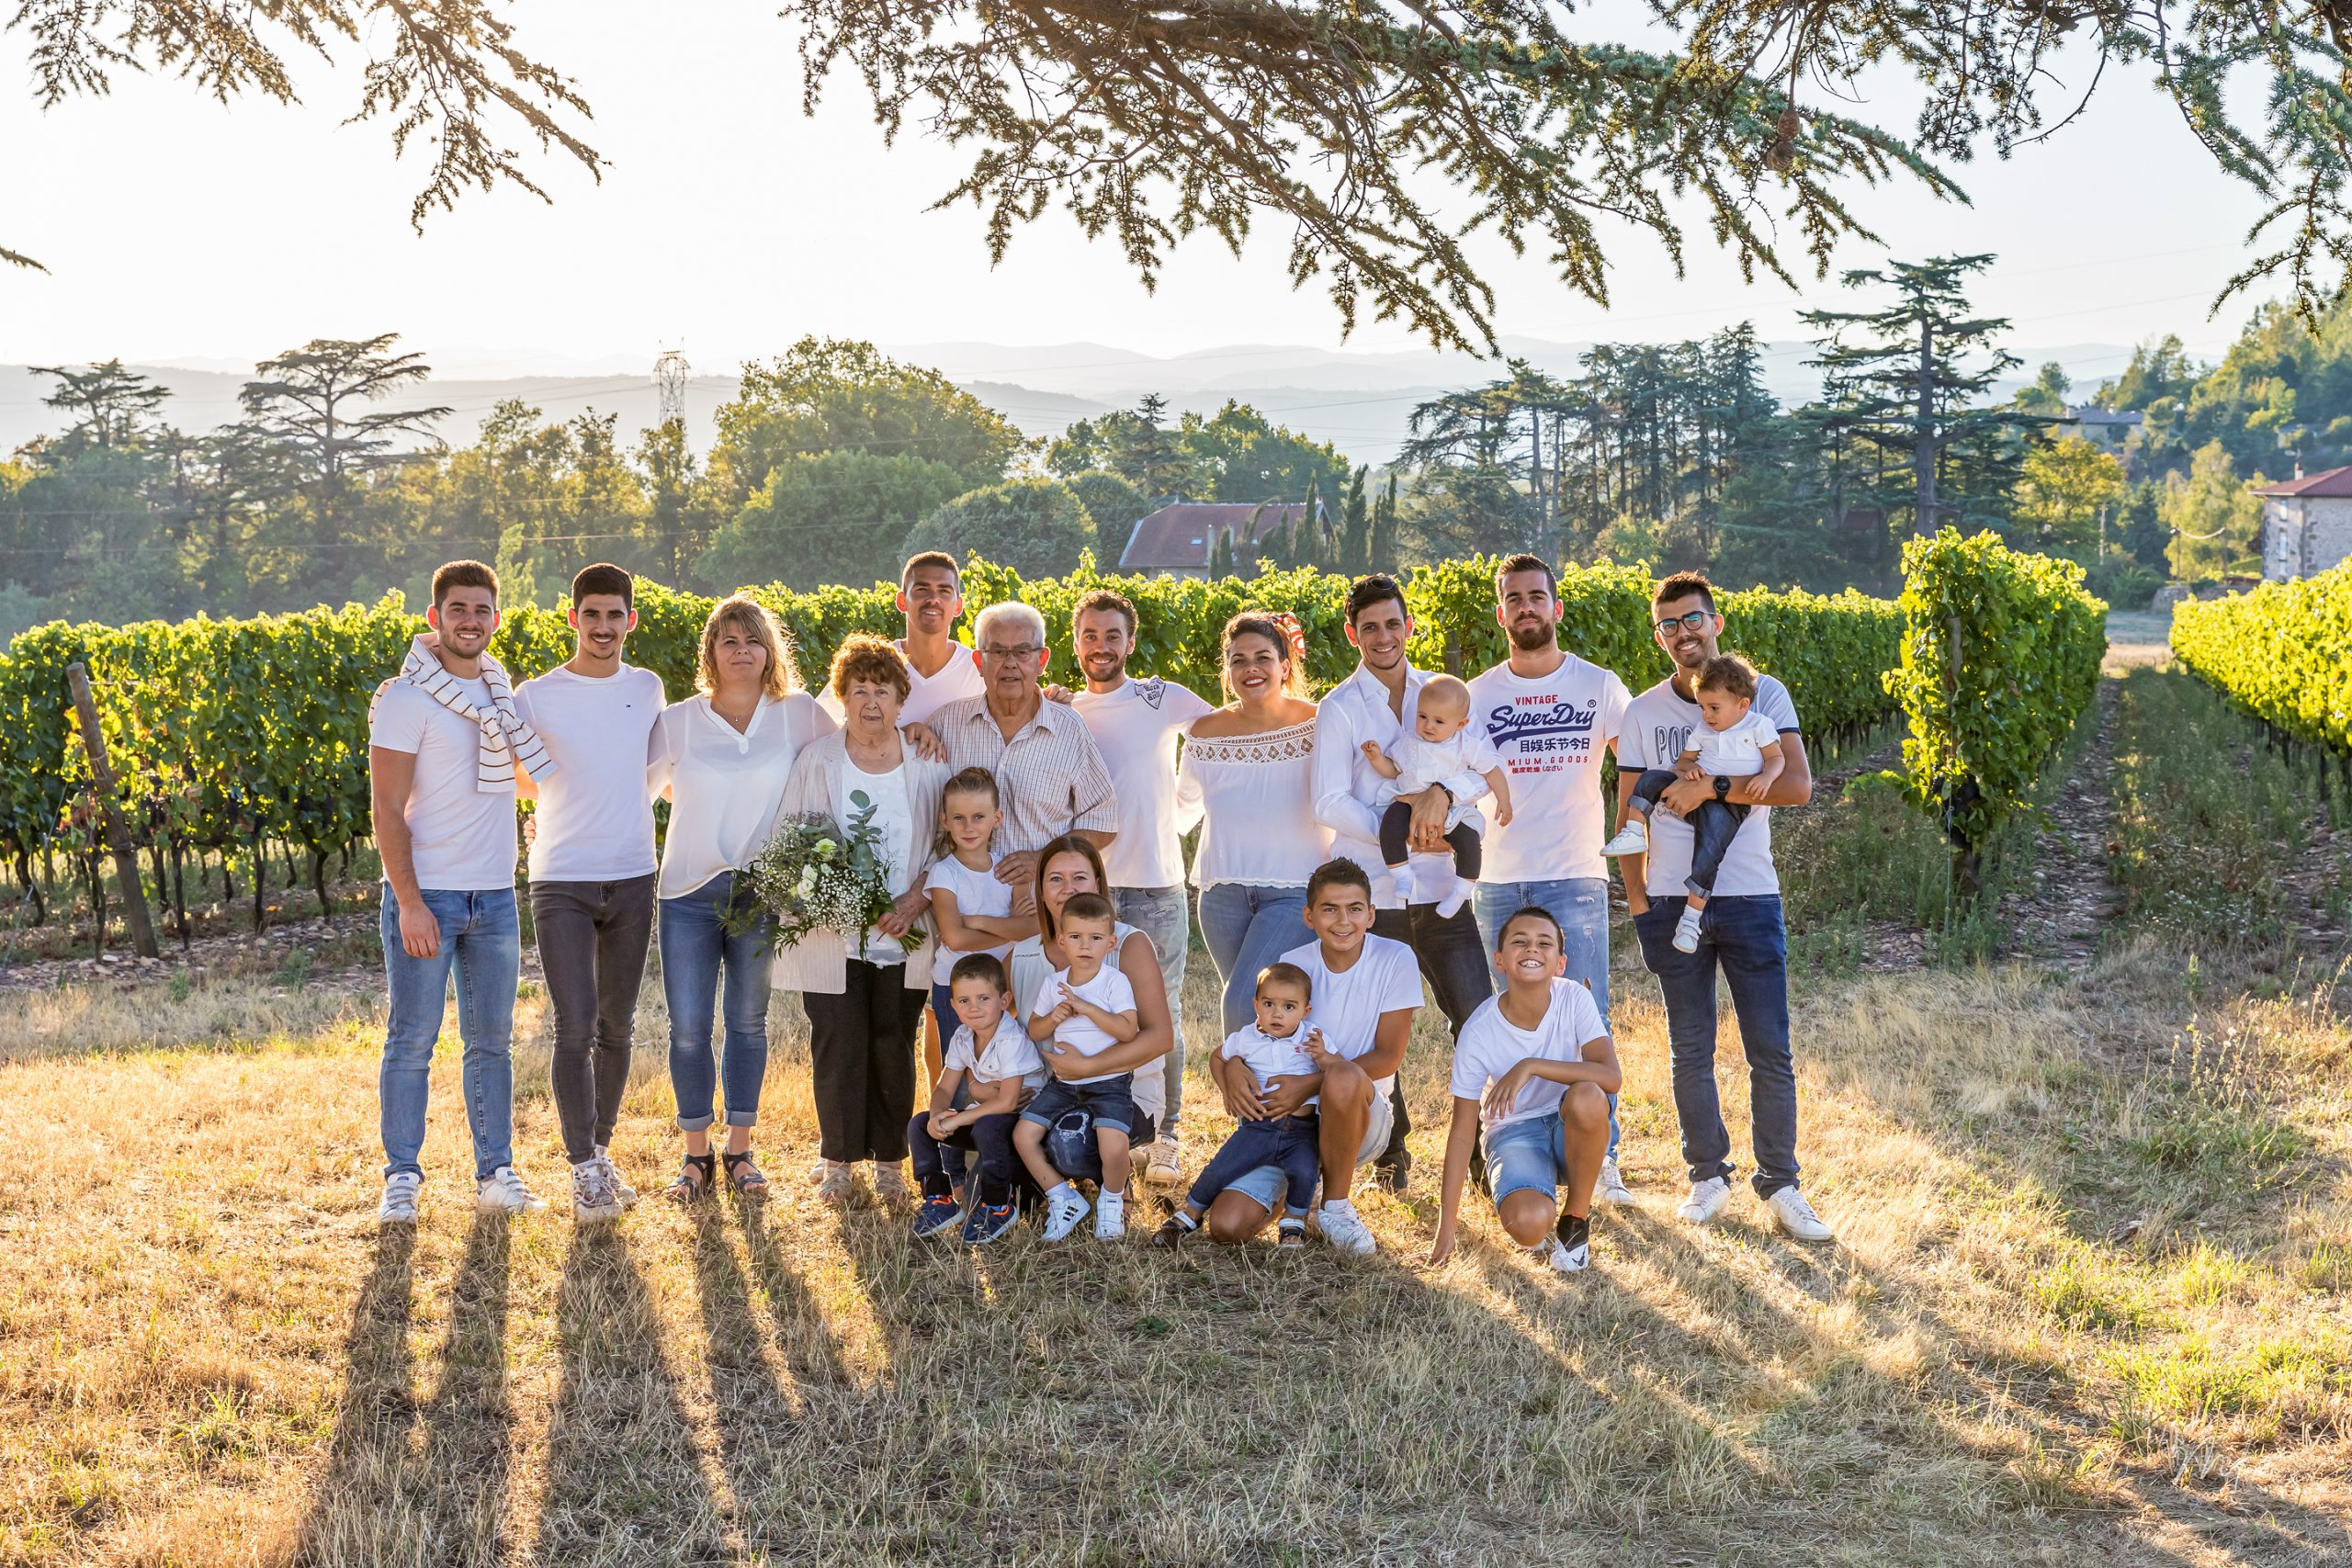 Familles & enfants - Marie Ismalun photographe-24